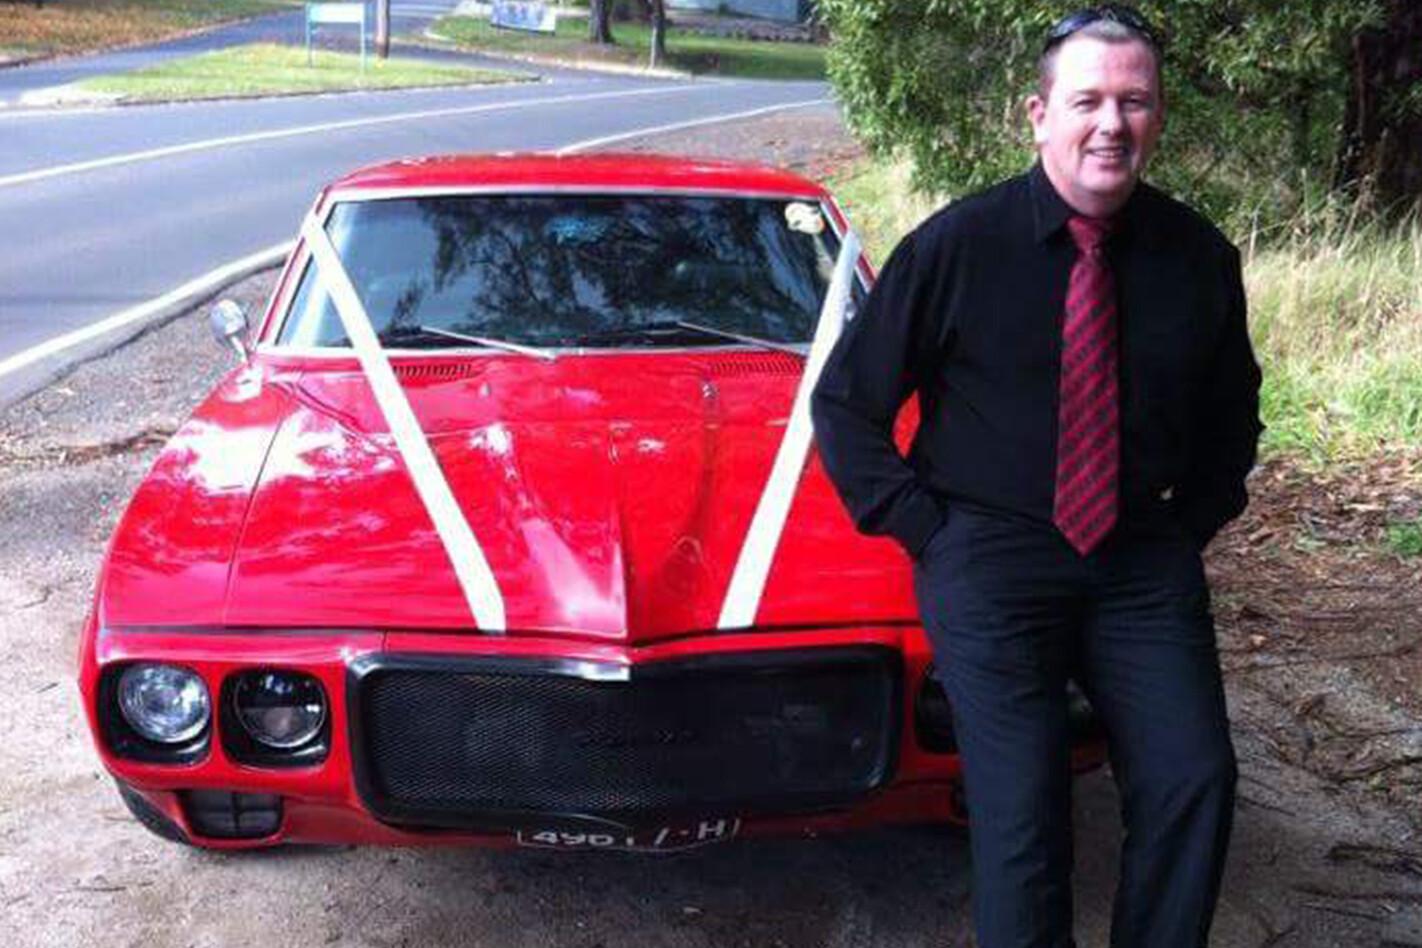 Loc Nawrik's Firebird wedding car